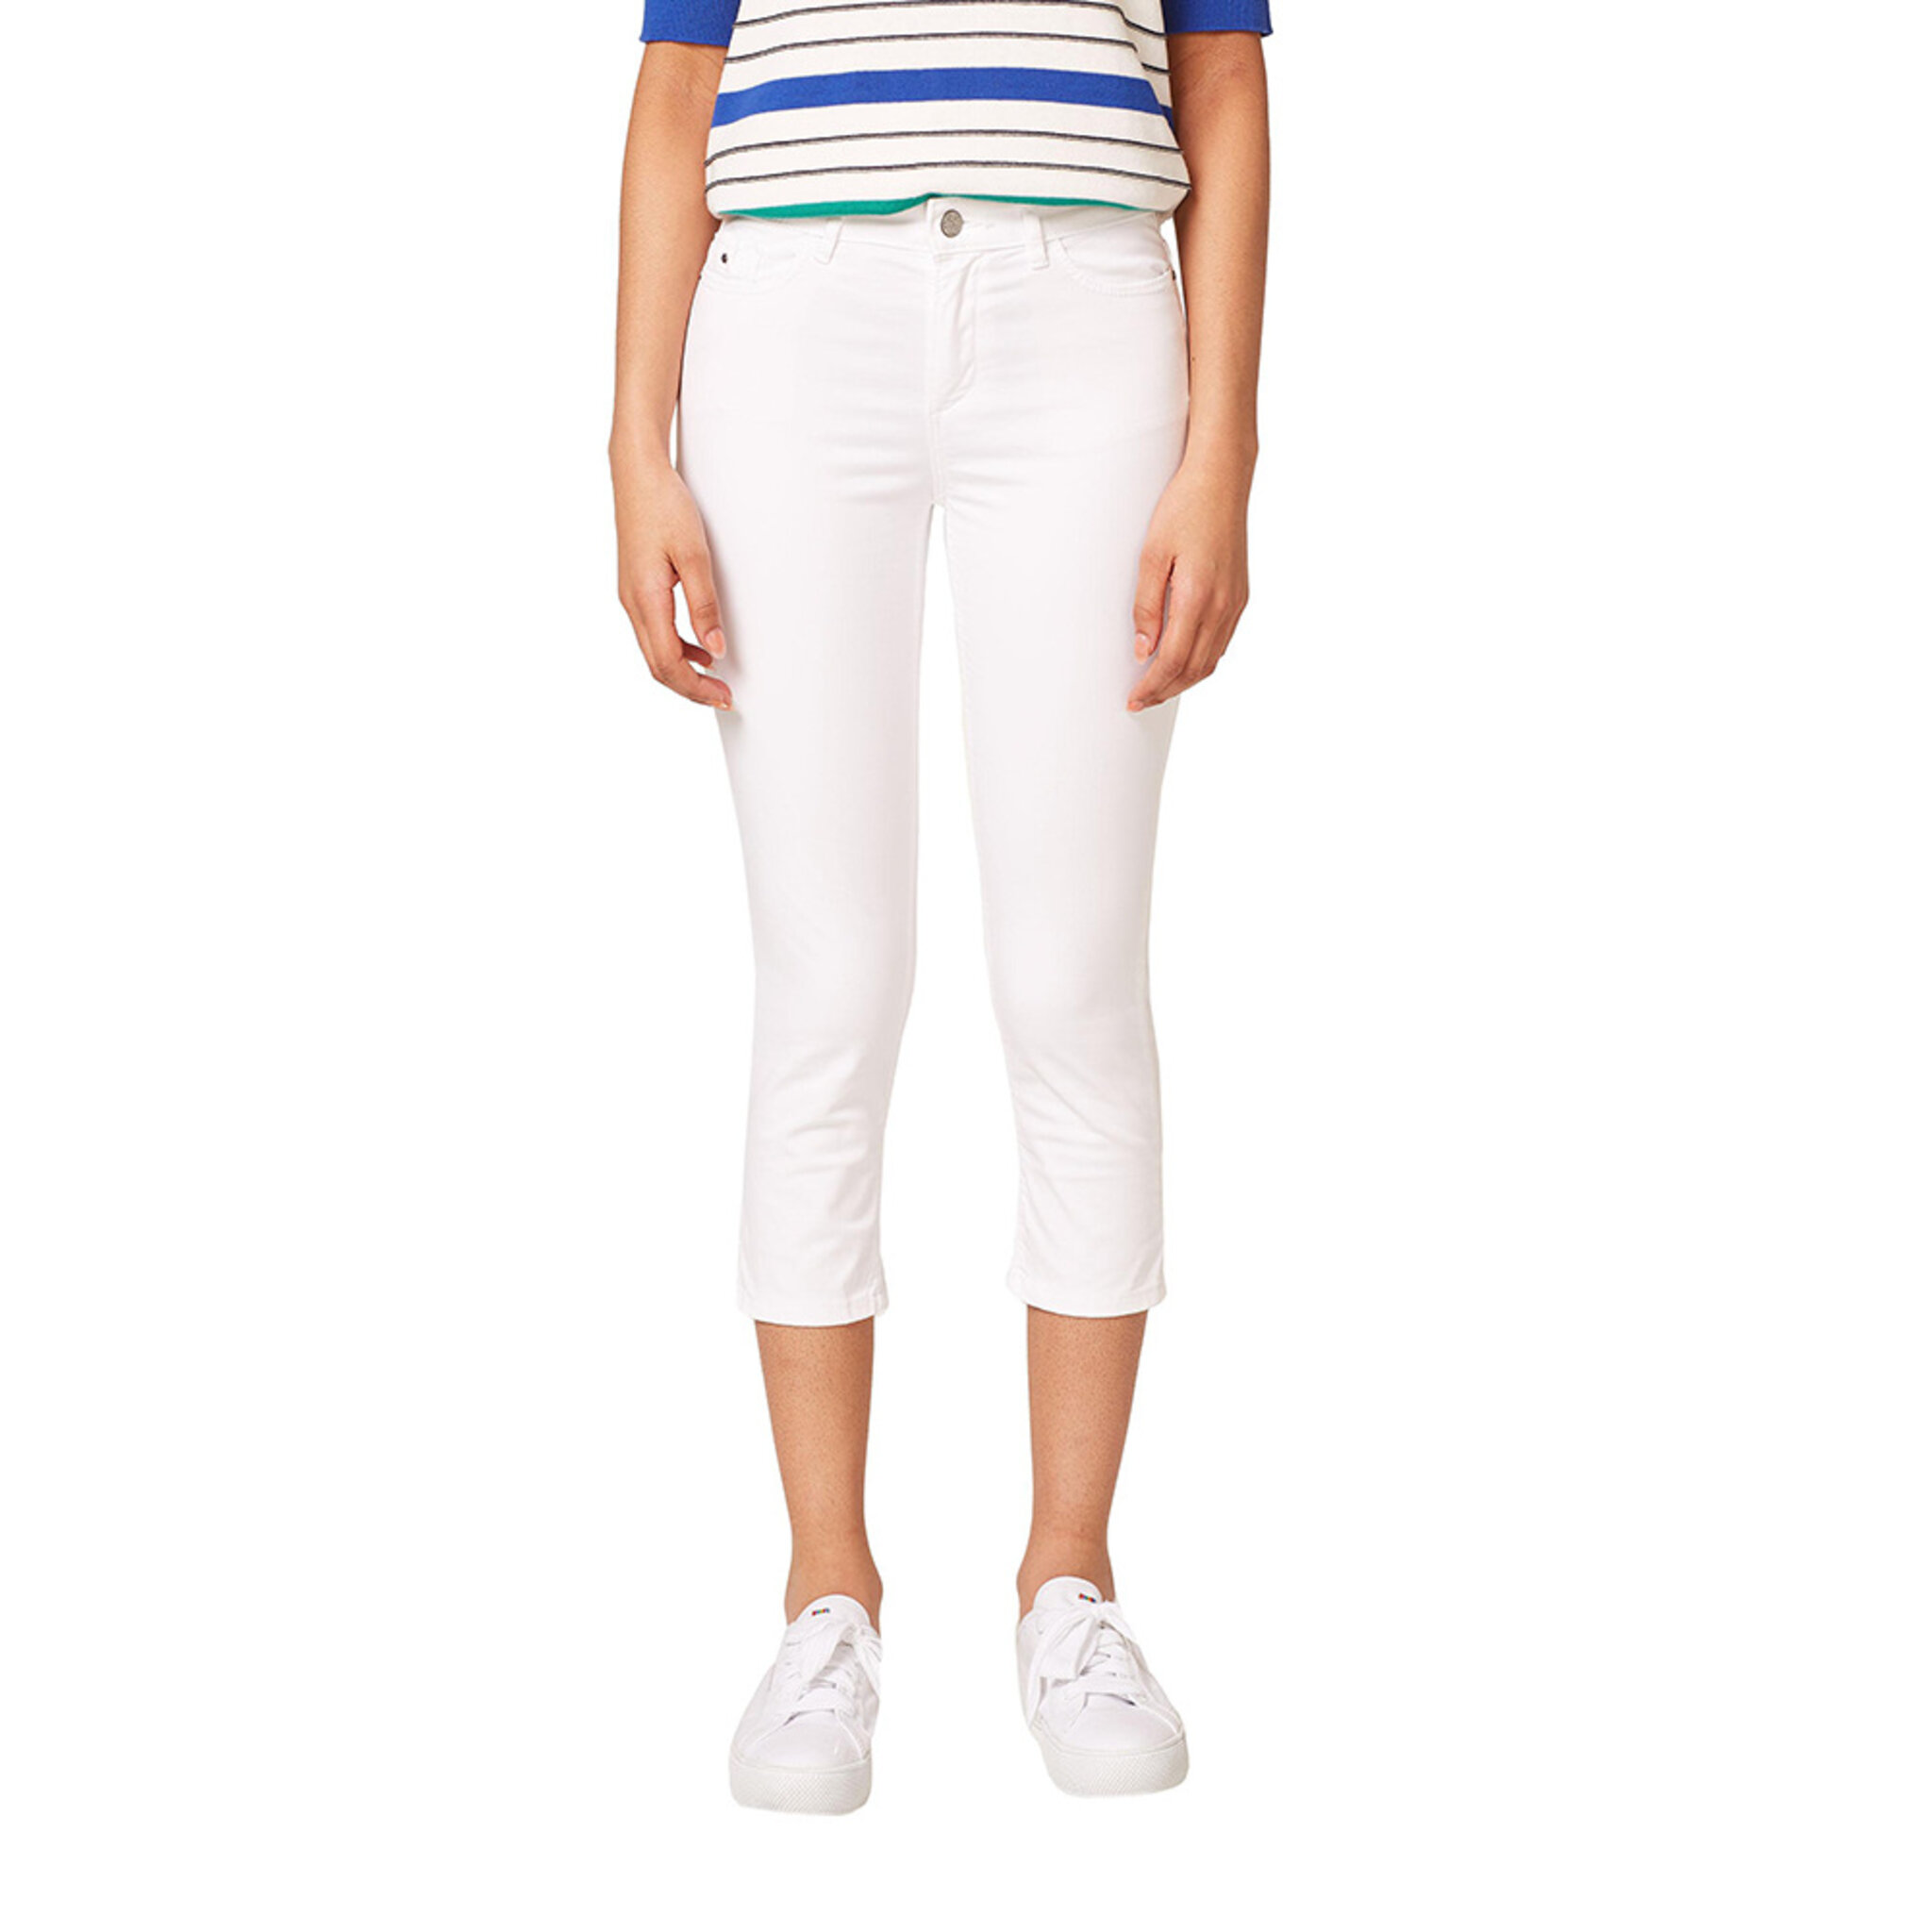 Kort slim byxa - Jeans - Köp online på åhlens.se! 08c2bd4db6a86